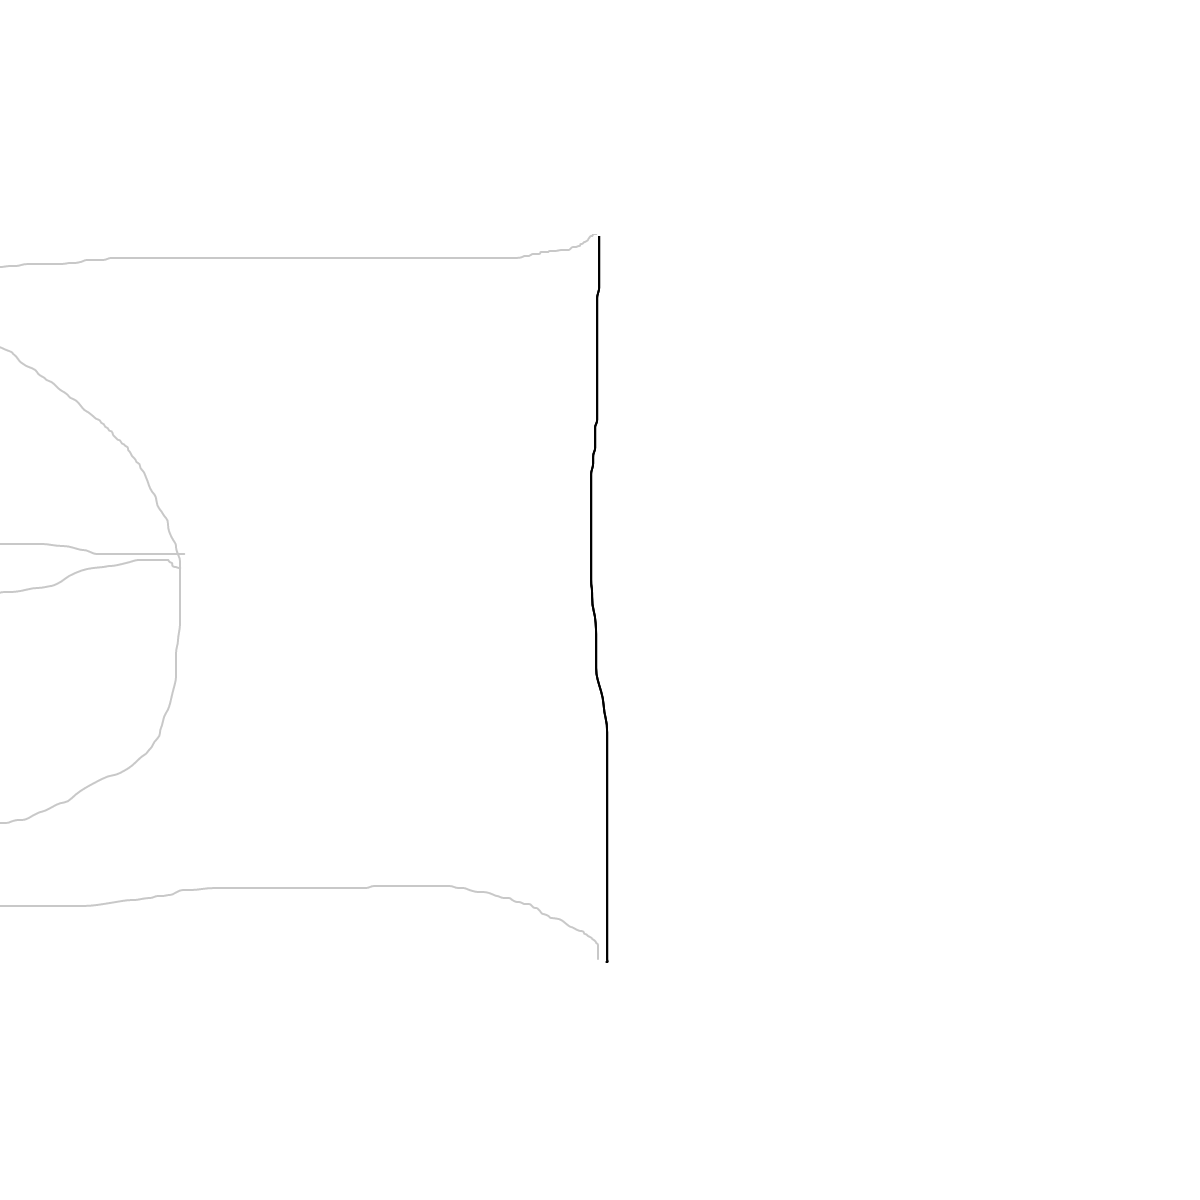 BAAAM drawing#23200 lat:54.5877418518066400lng: -5.9346623420715330